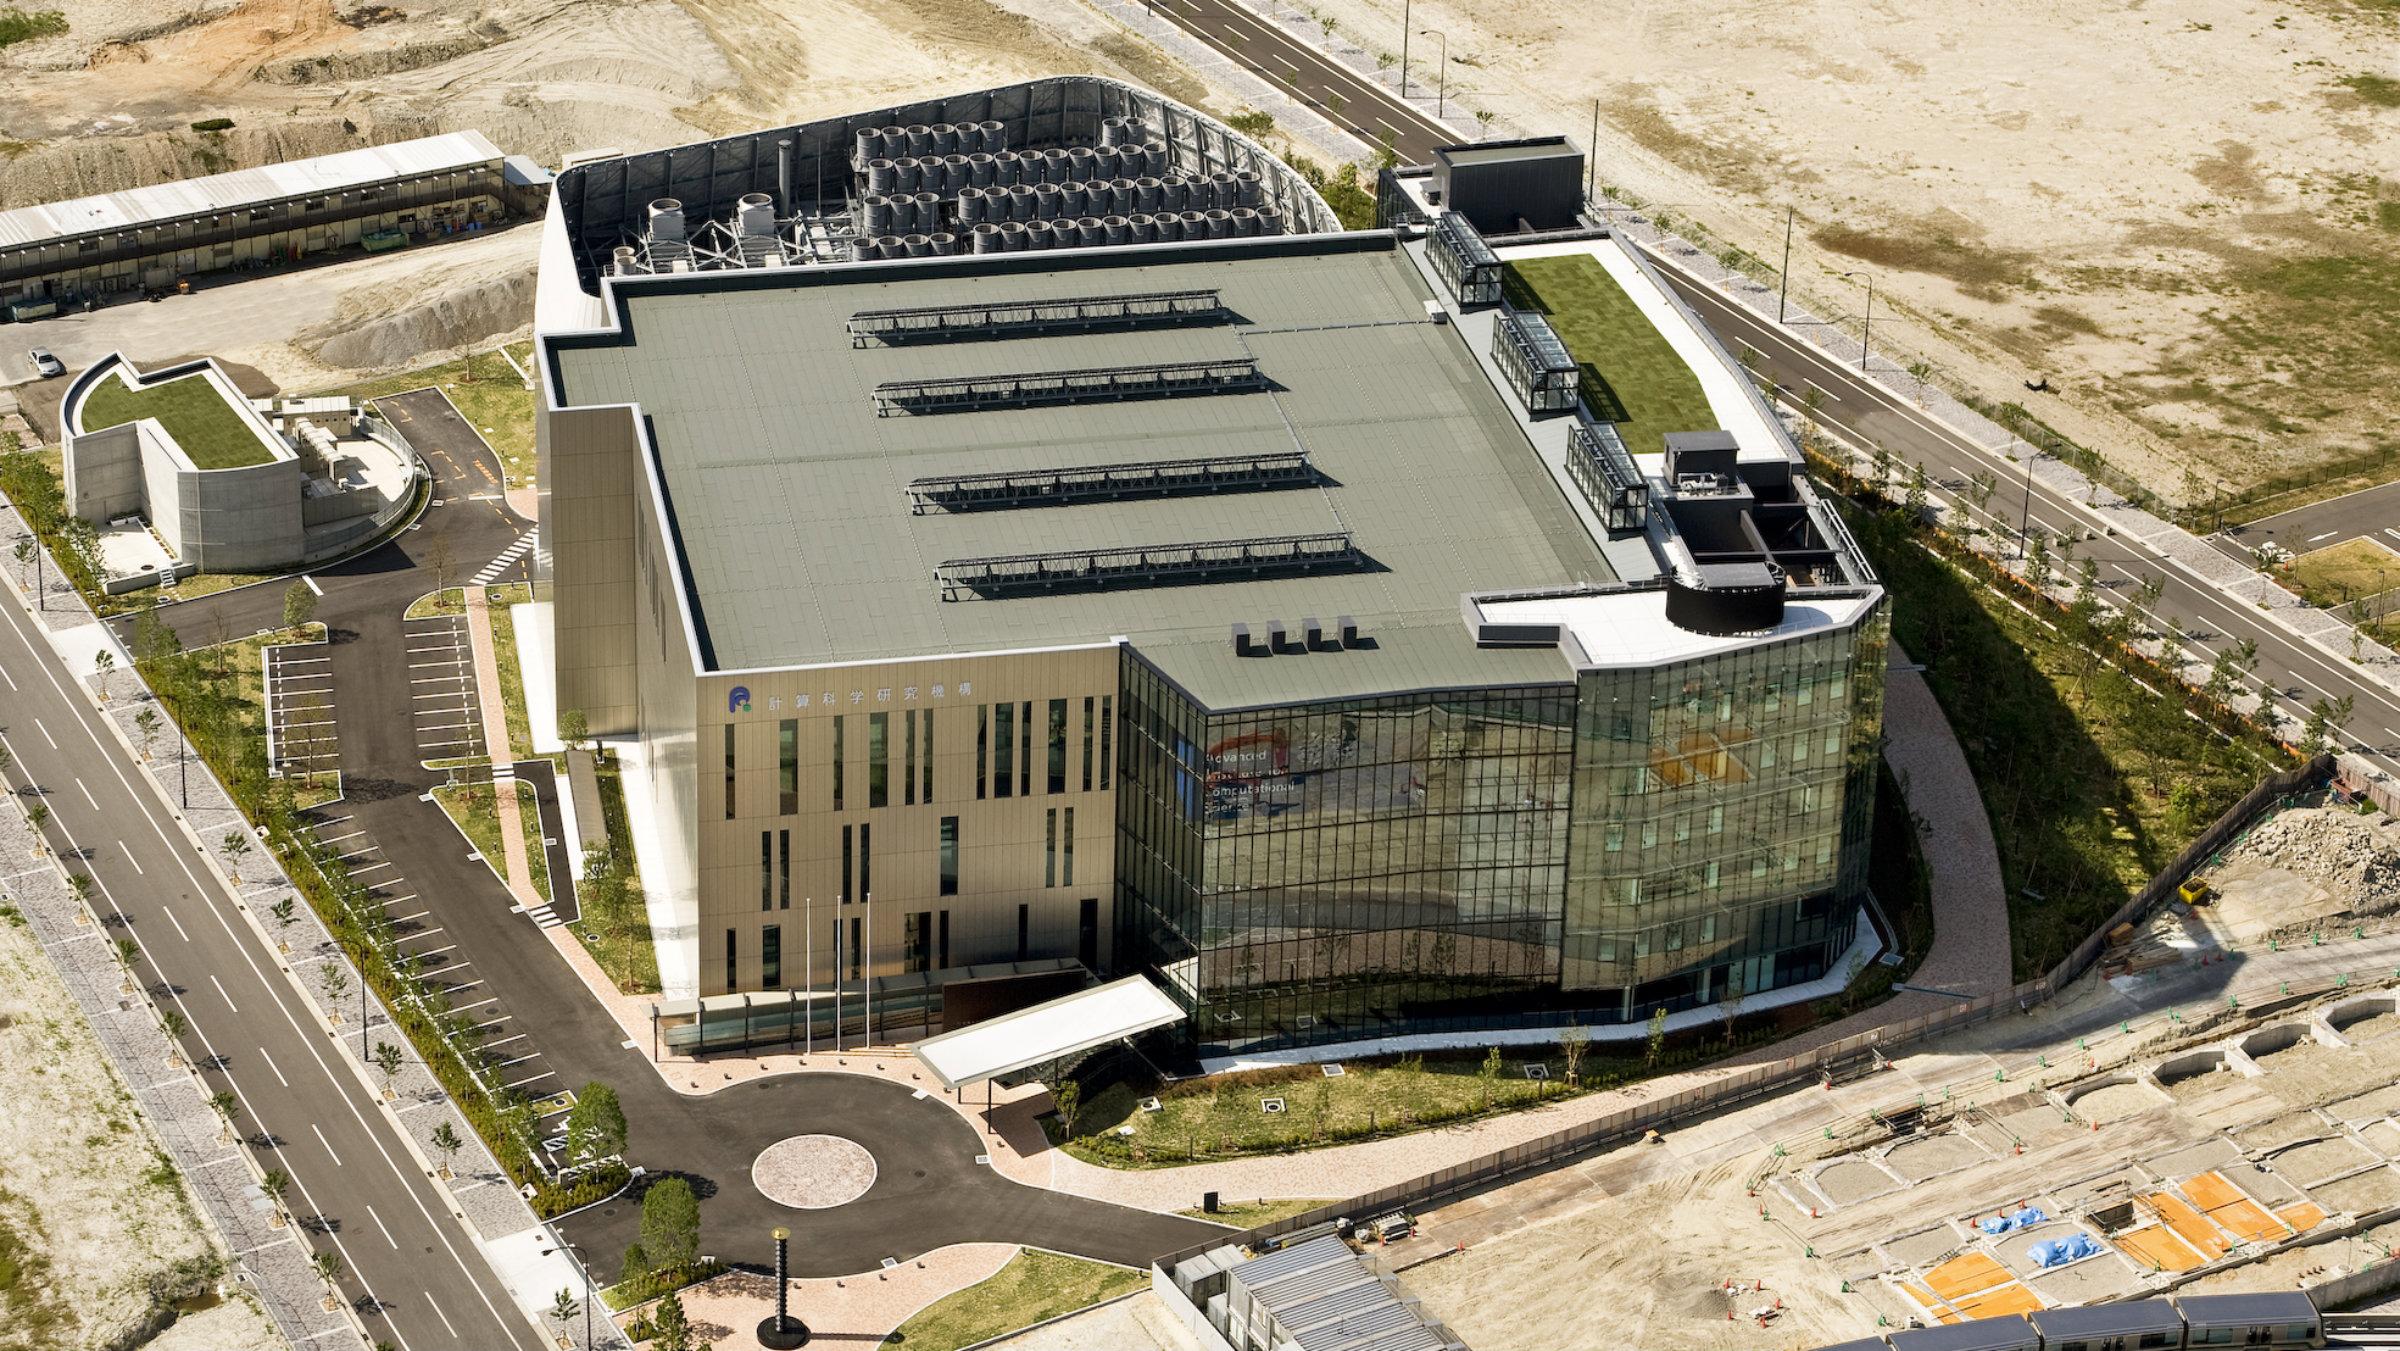 K Computer brain simulation building